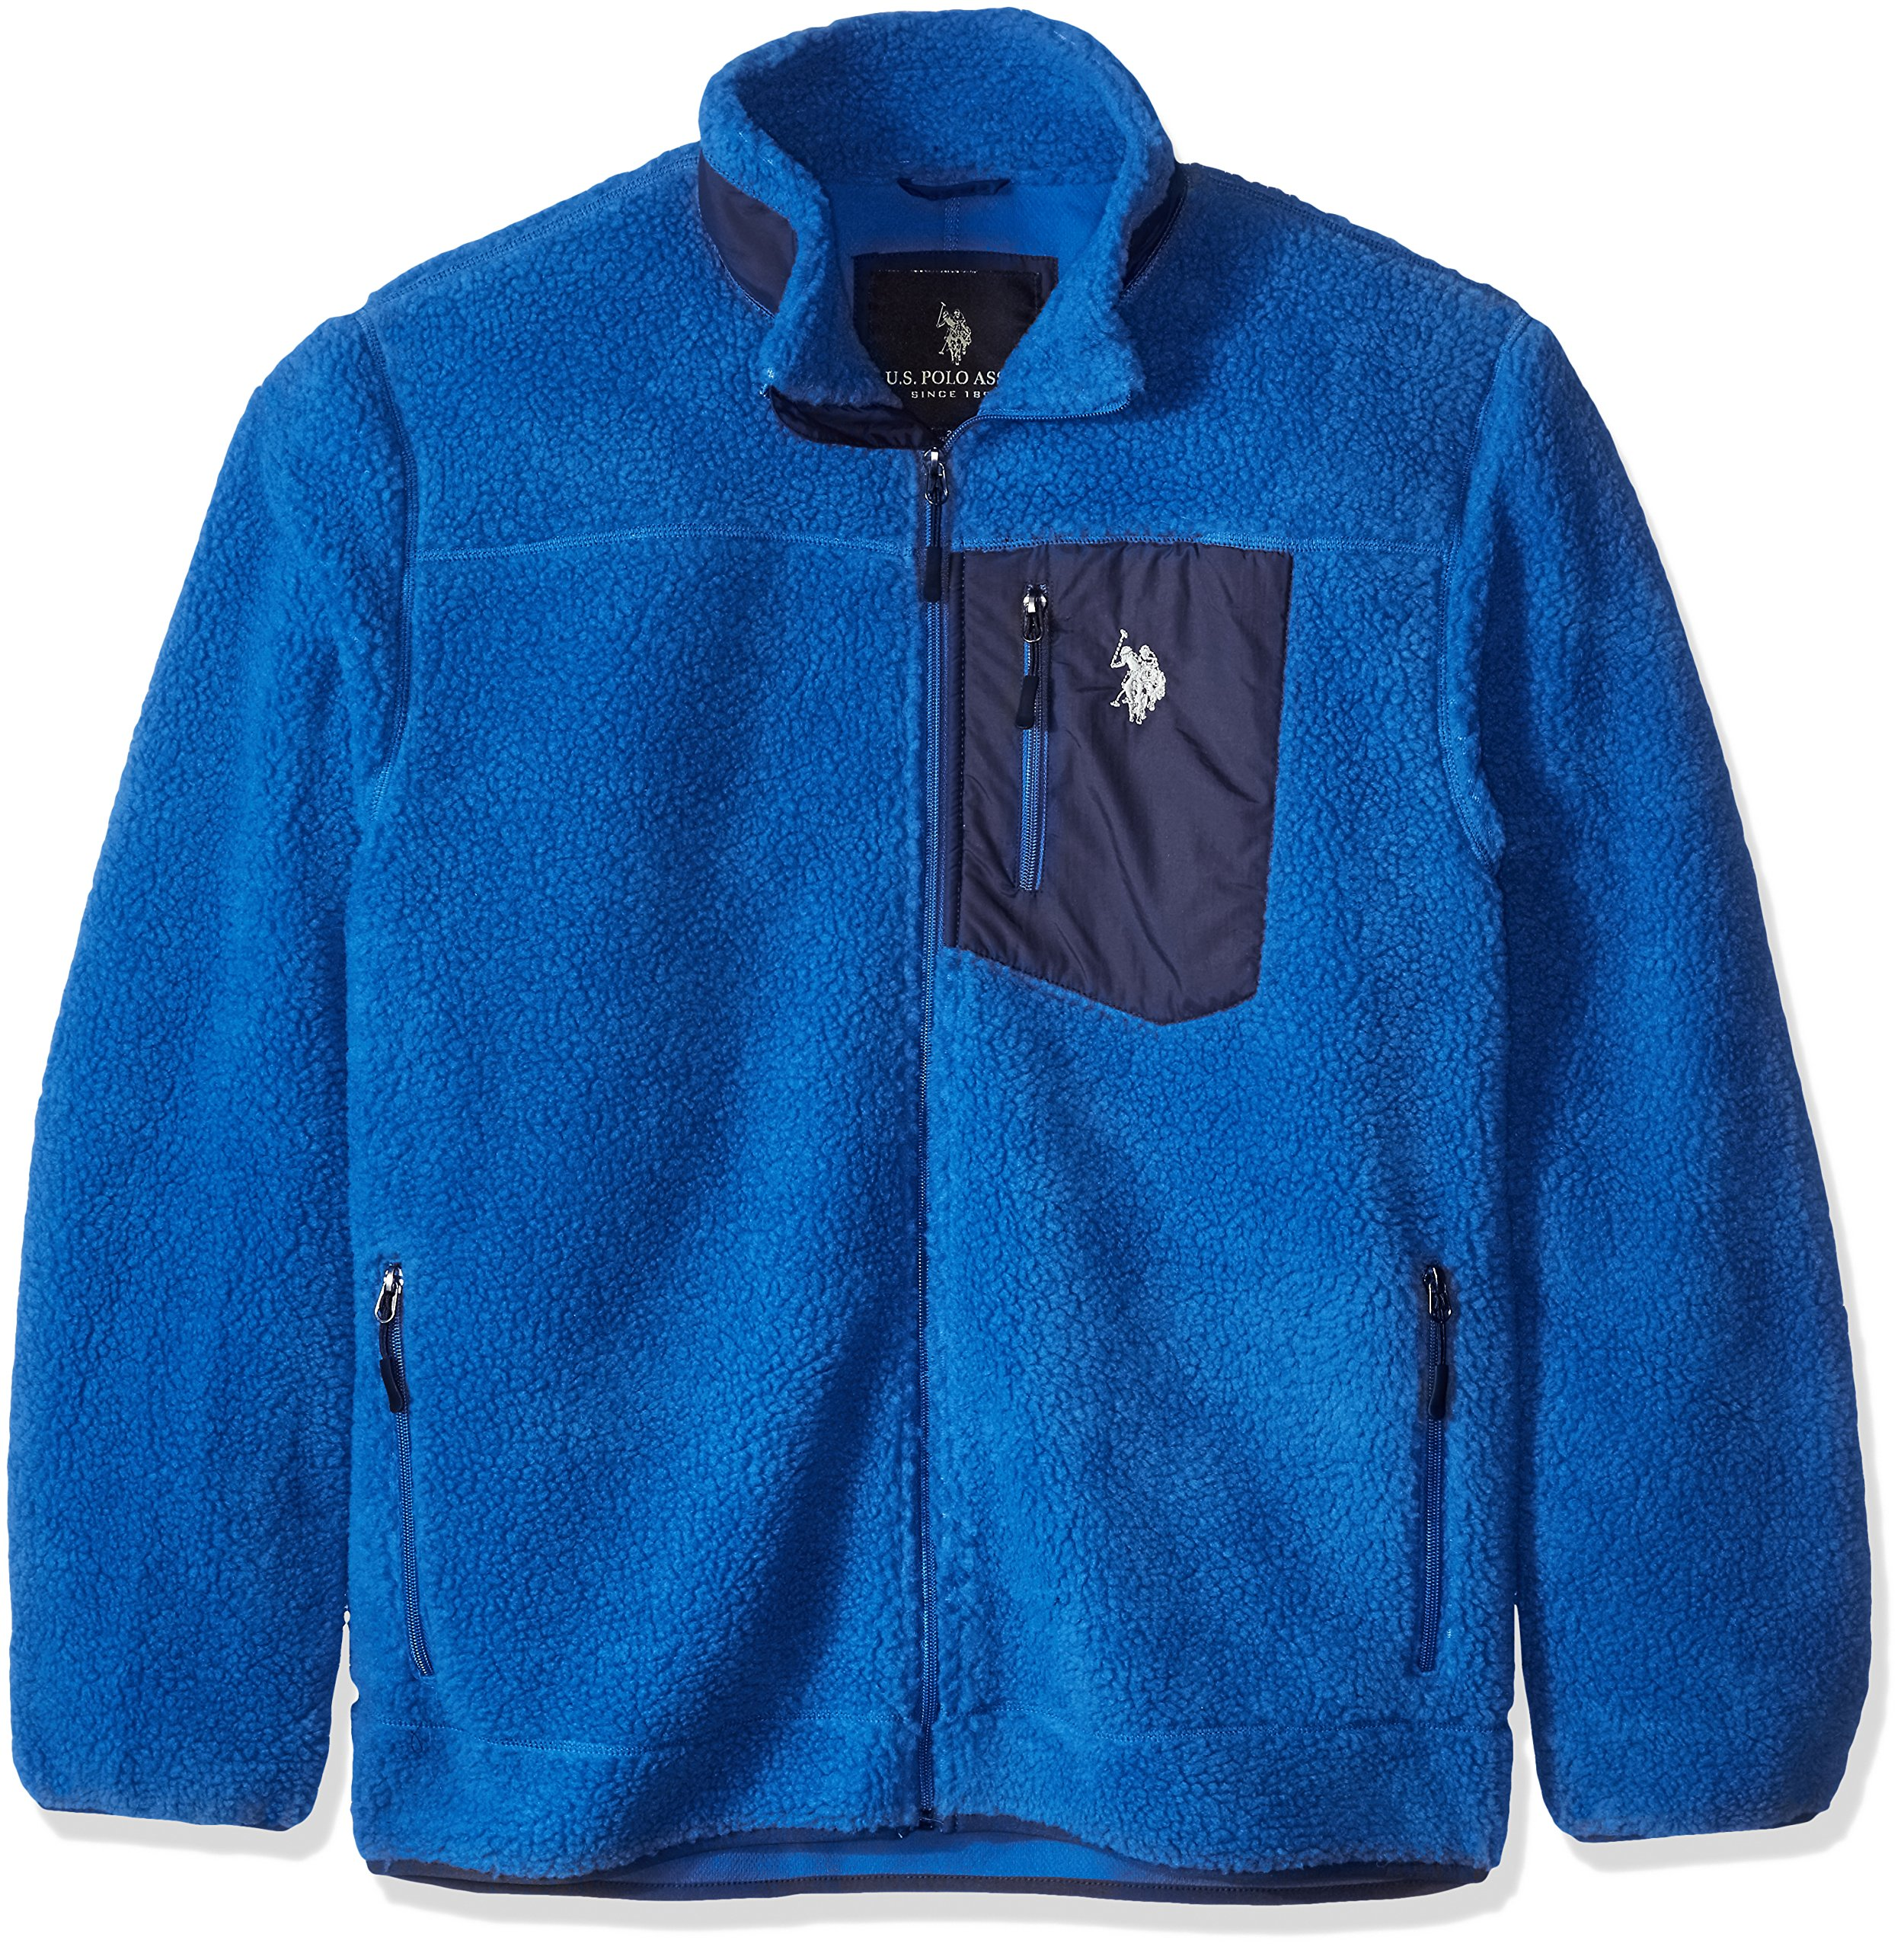 U.S. Polo Assn. Men's Faux Sherpa Jacket, China Blue, X-Large by U.S. Polo Assn.